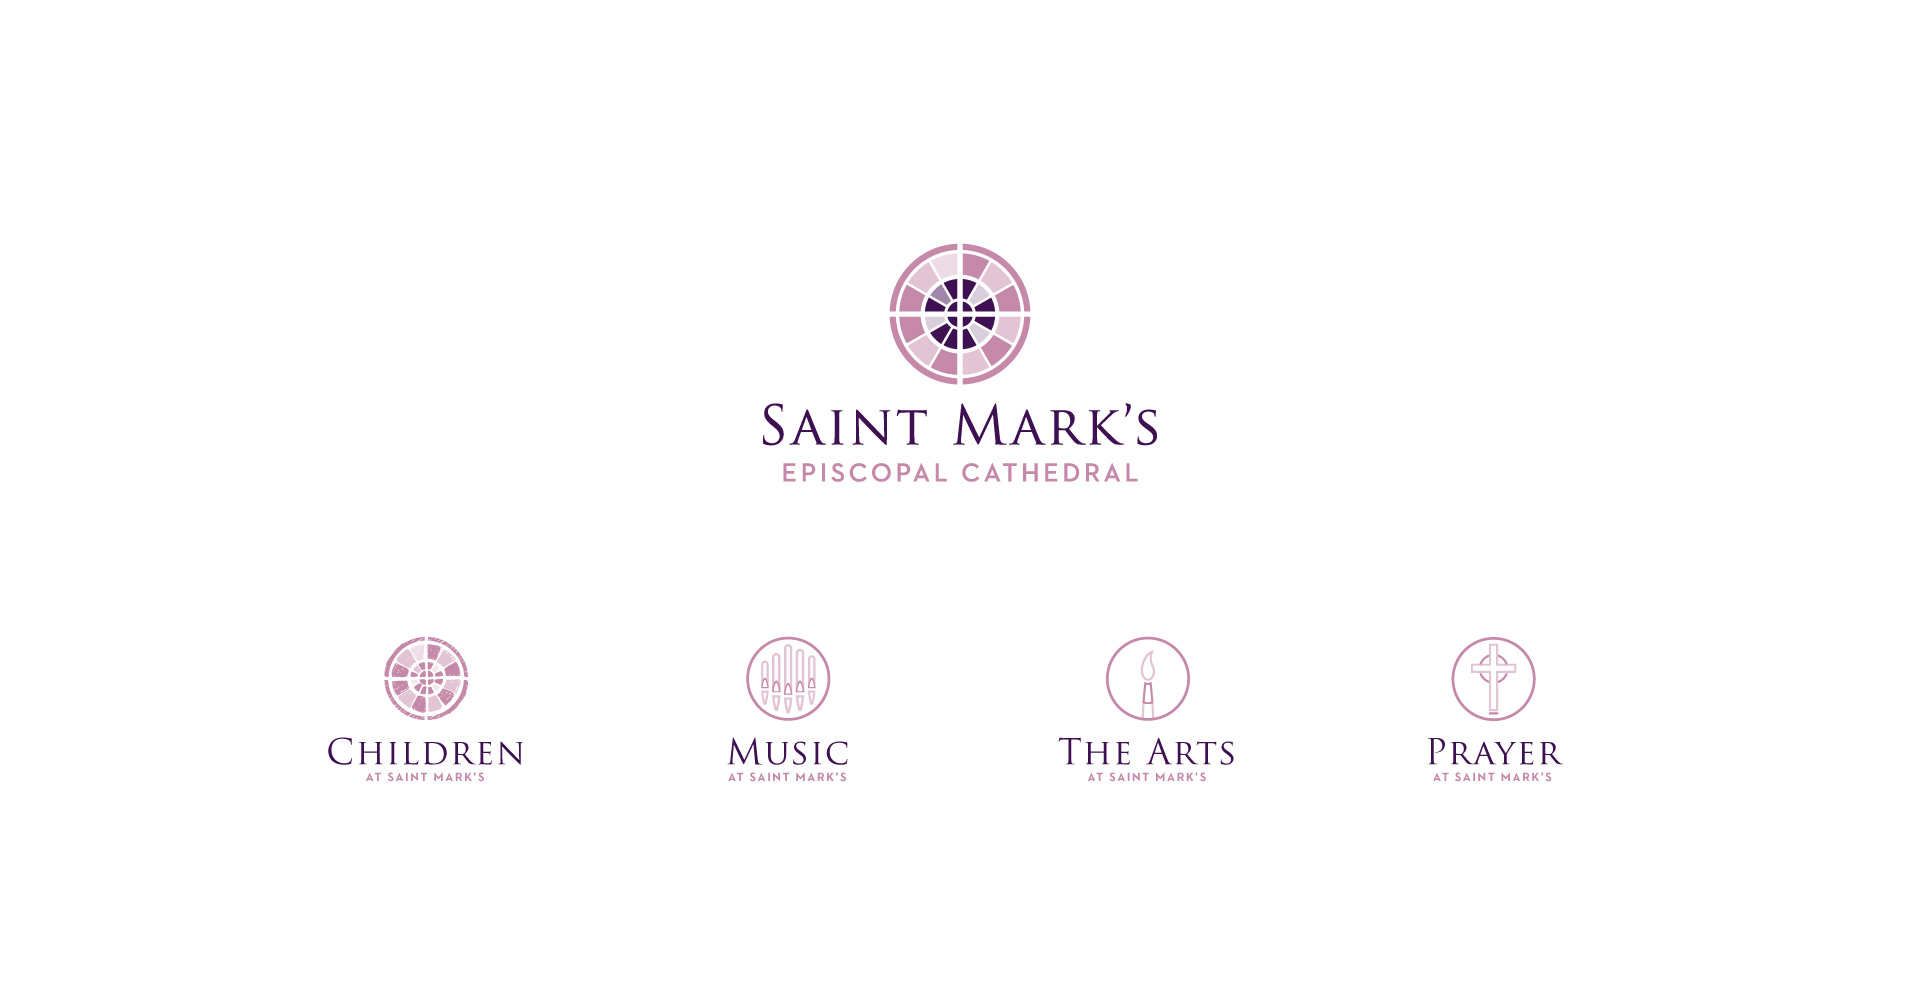 Creative_Retail_Packaging_Saint_Marks_Episcopal_Cathedral_Branding_Identity_3.jpg